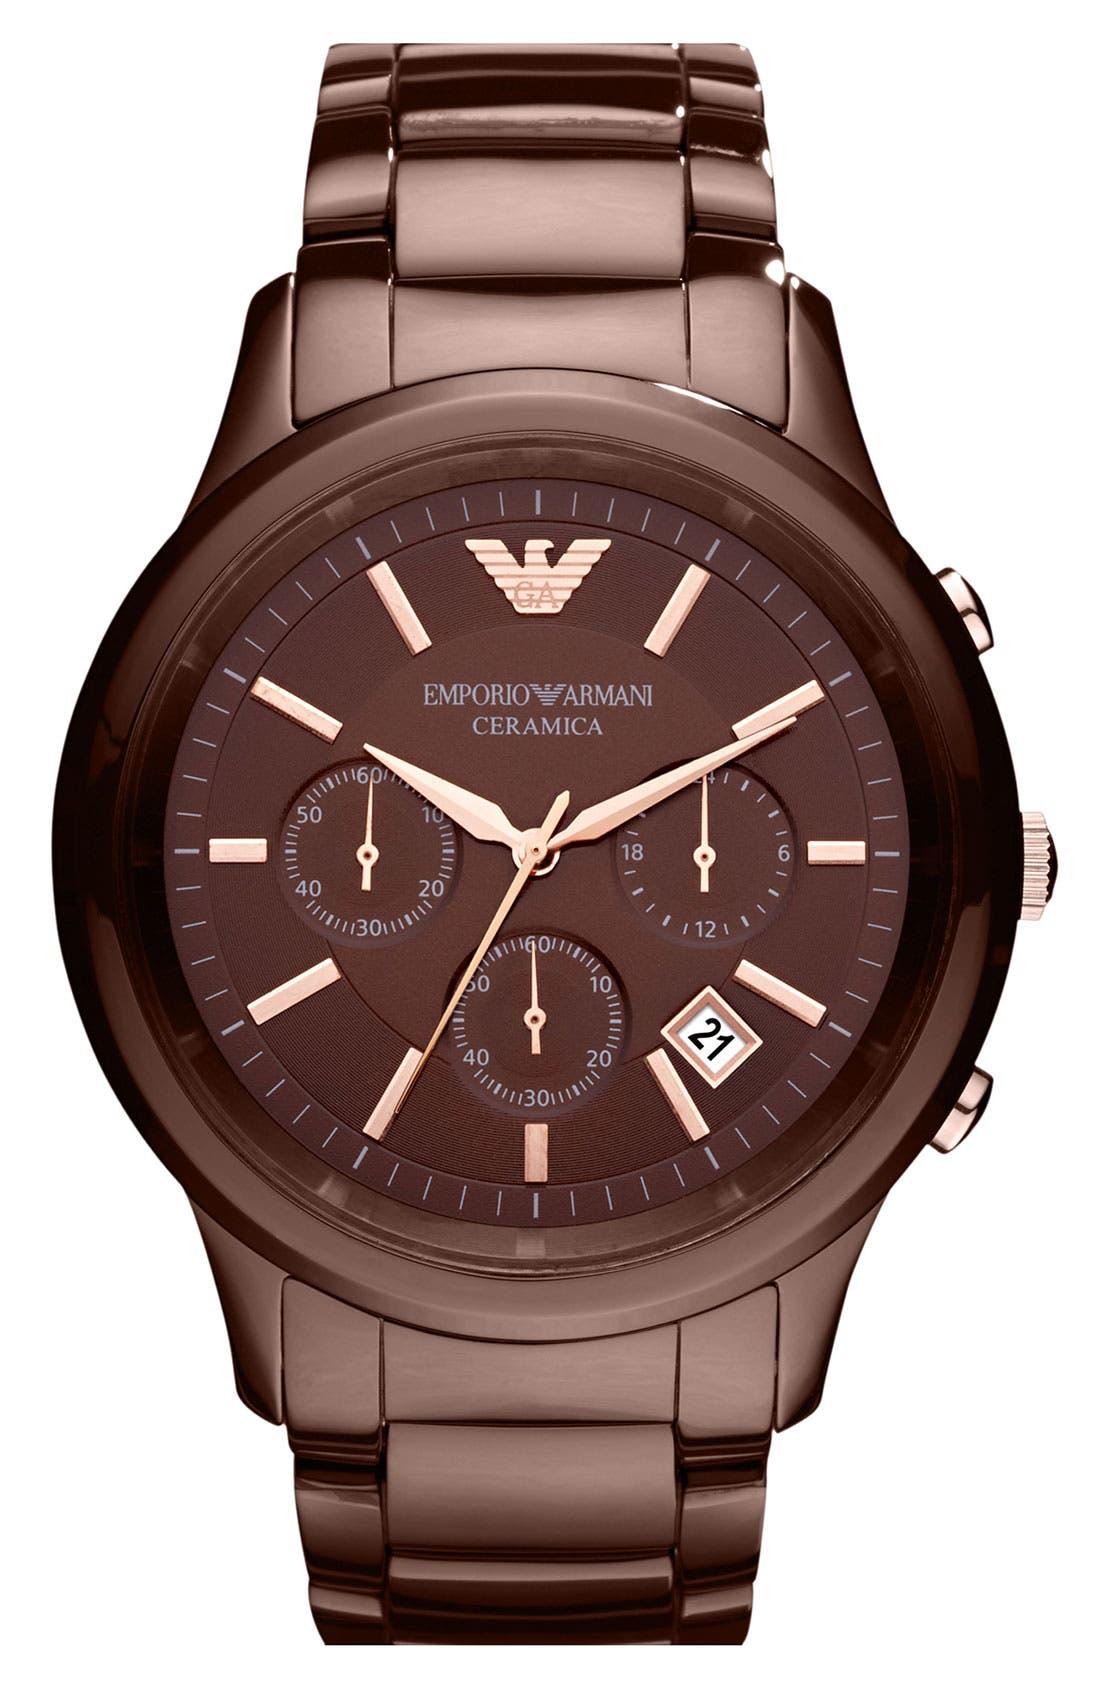 Main Image - Emporio Armani Ceramic Chronograph Watch